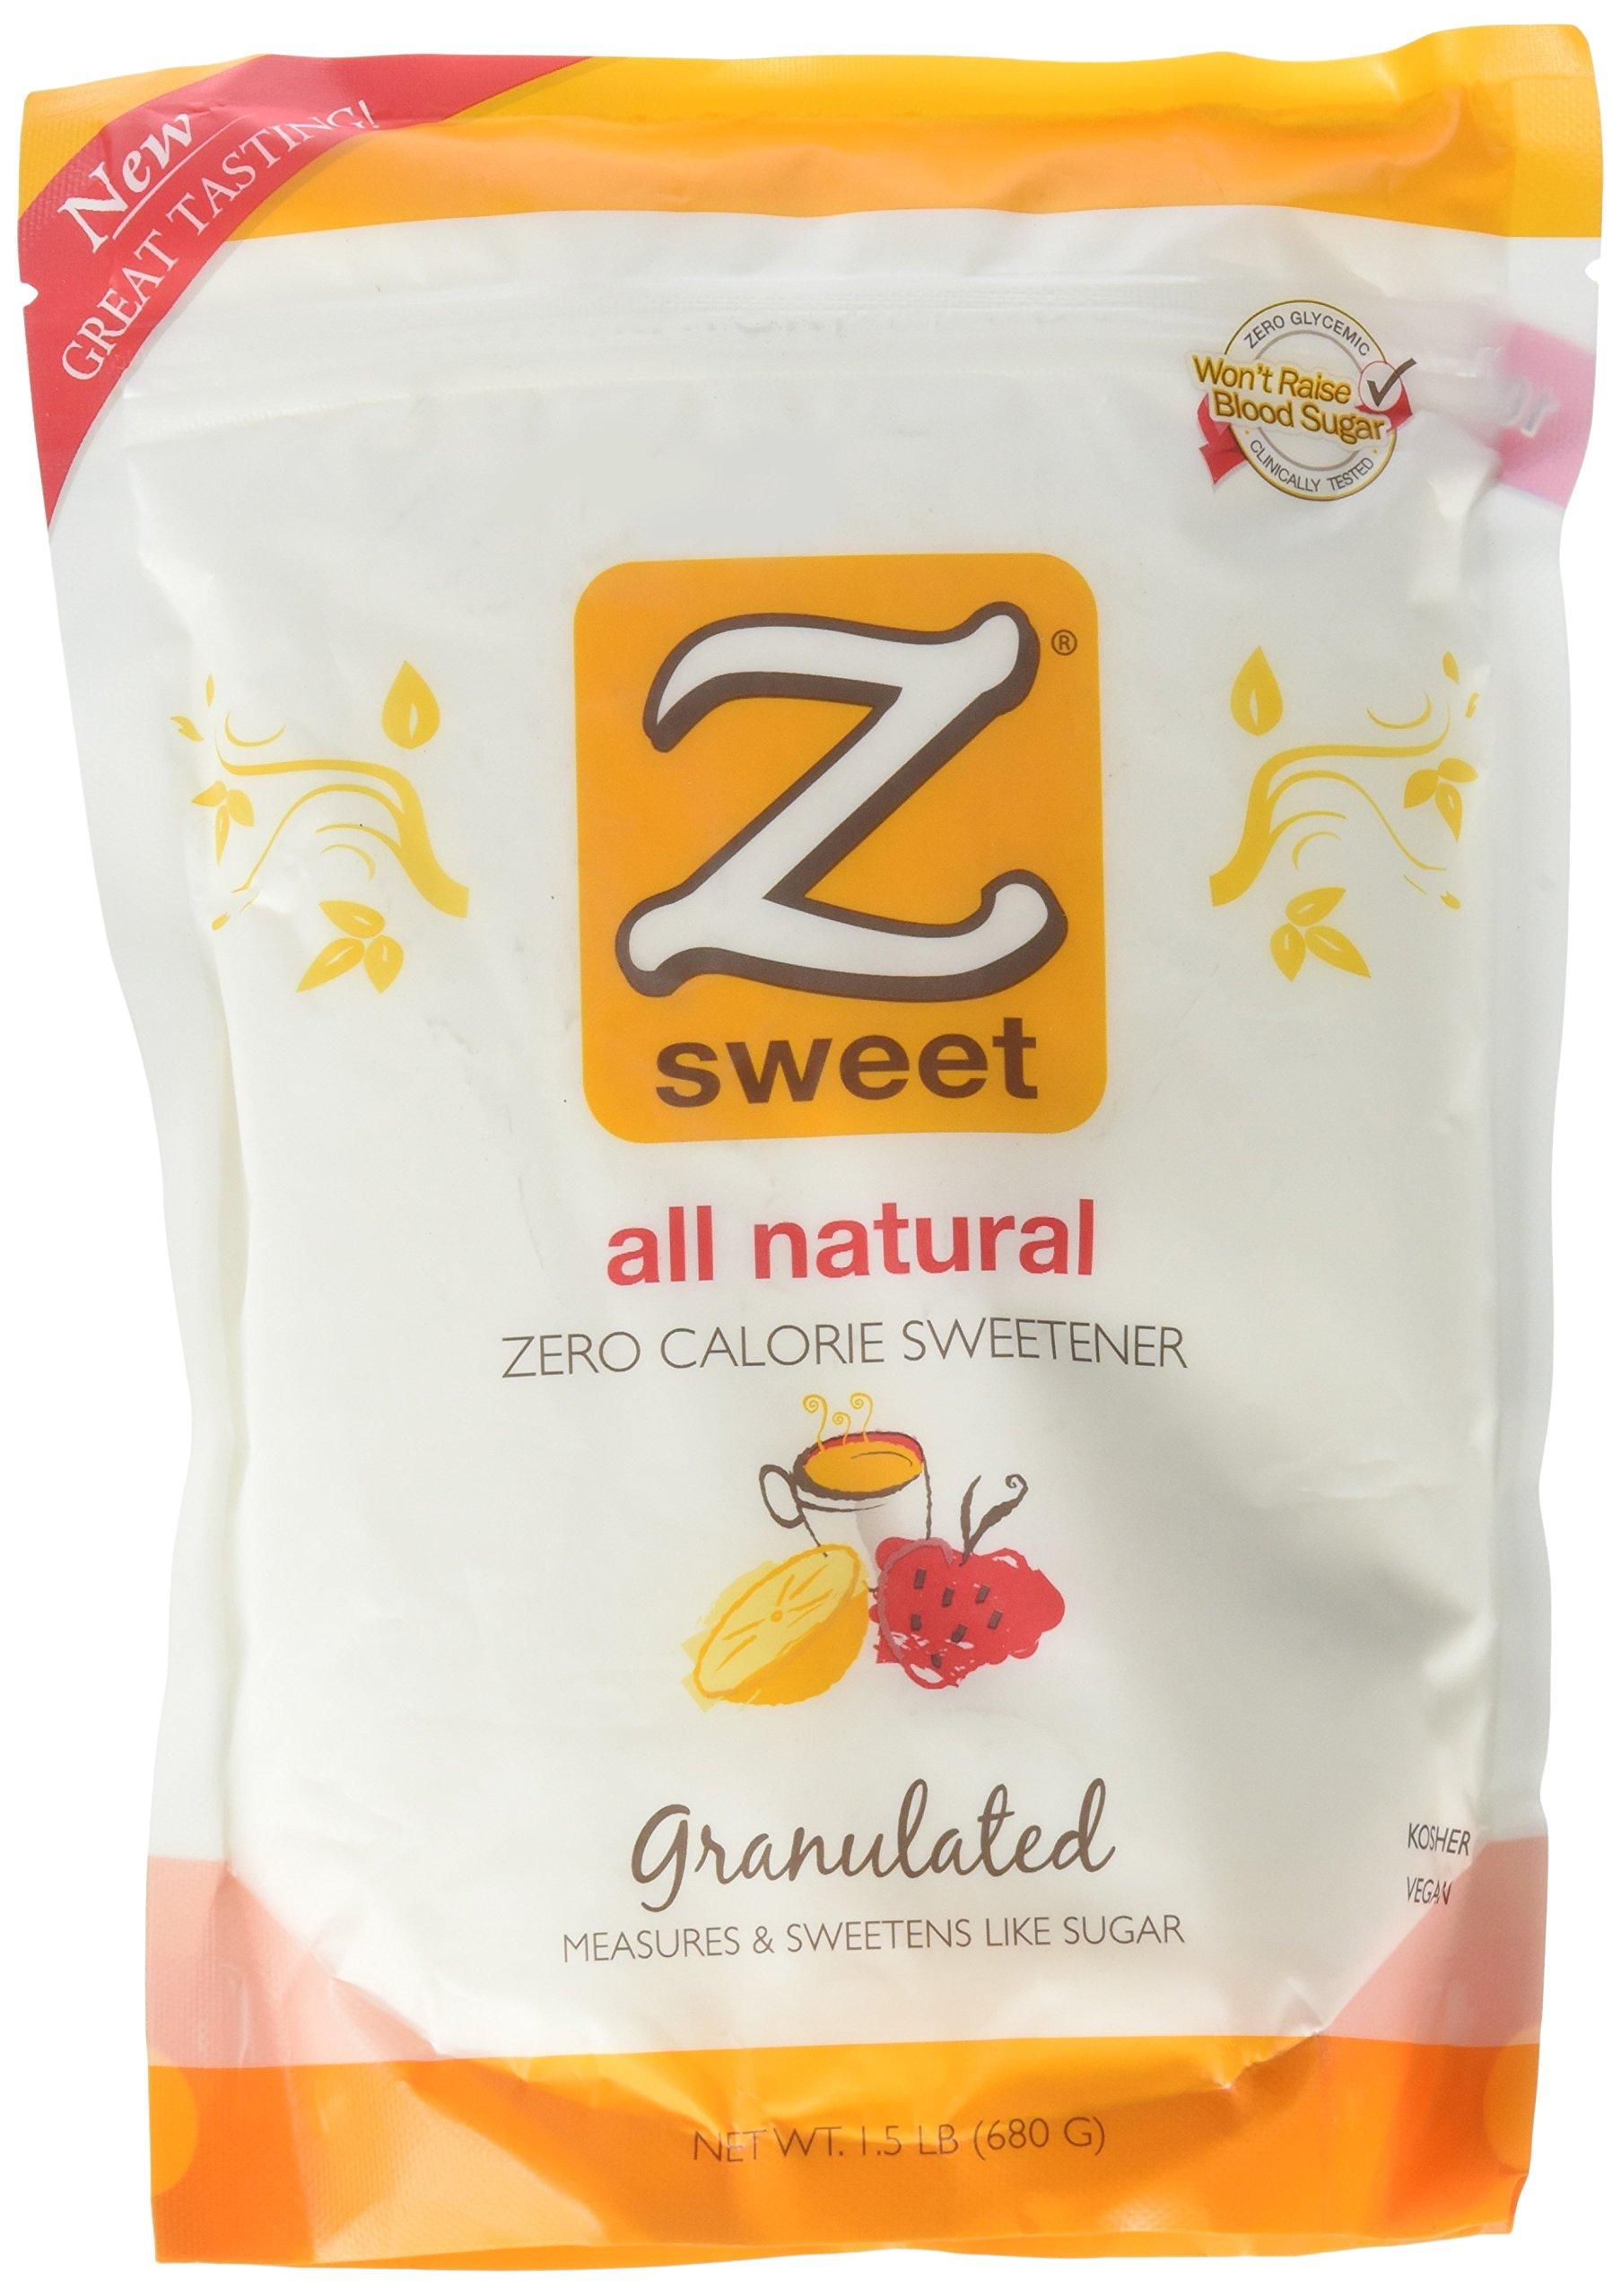 Zsweet All Natural Zero Calorie Sweetener - 1.5 lb